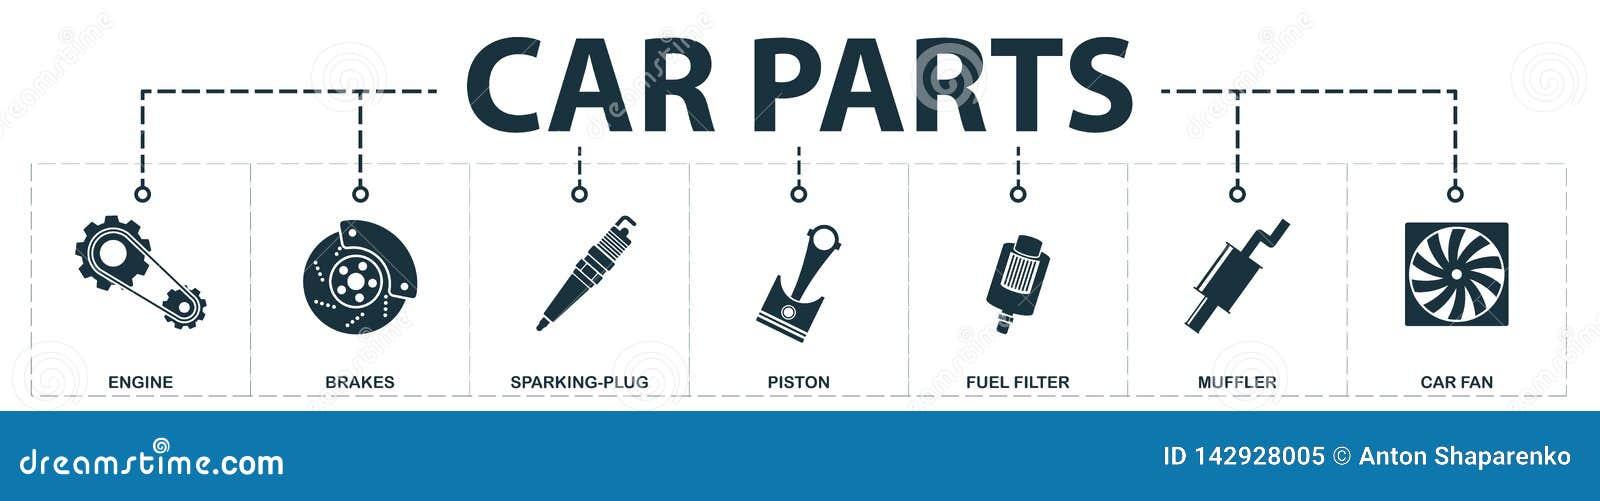 Car Parts Set Icons Collection  Includes Simple Elements